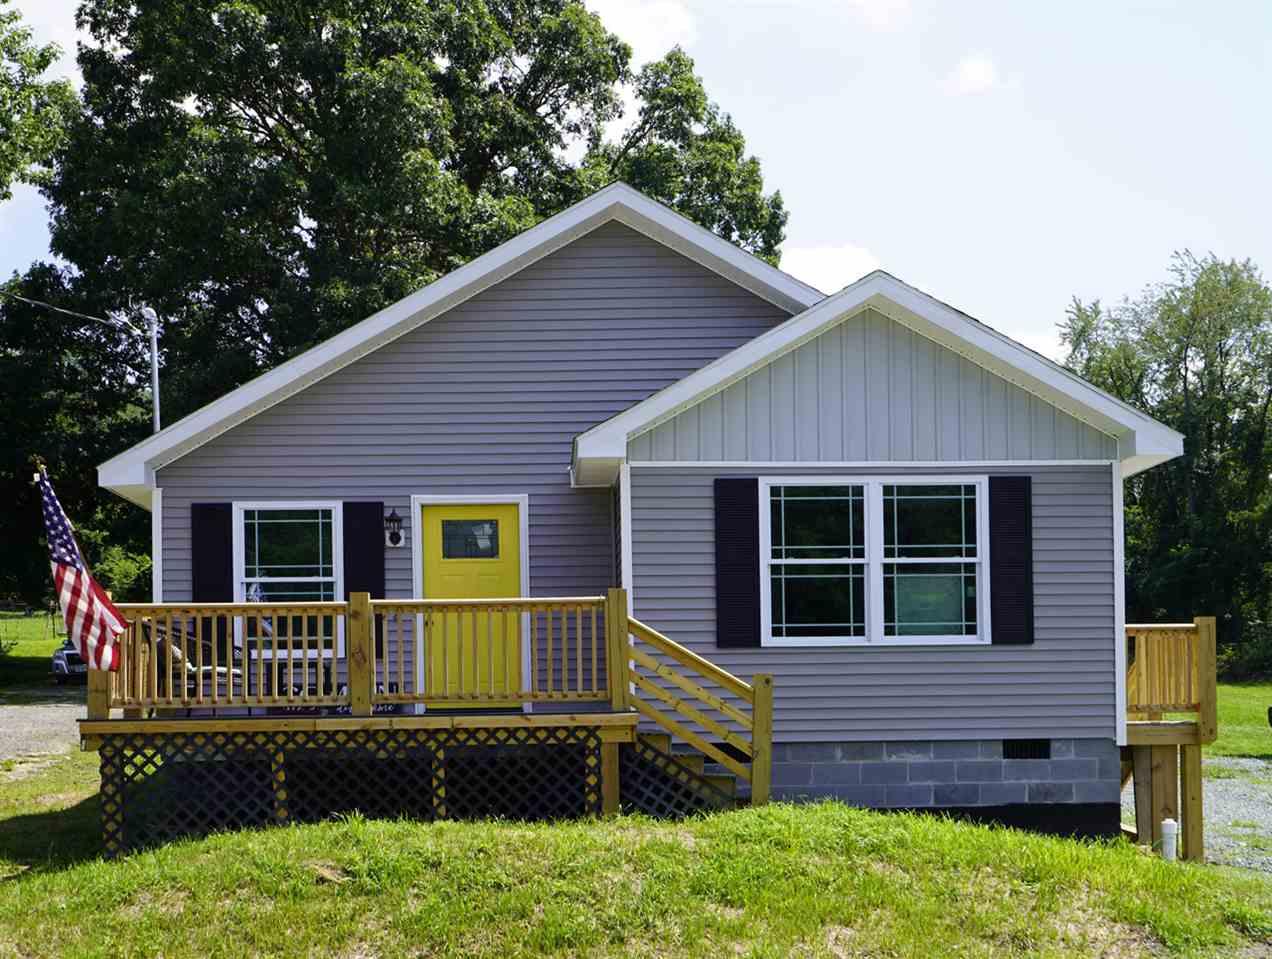 Single Family for Sale at 1074 Albemarle Ave 1074 Albemarle Ave Waynesboro, Virginia 22980 United States